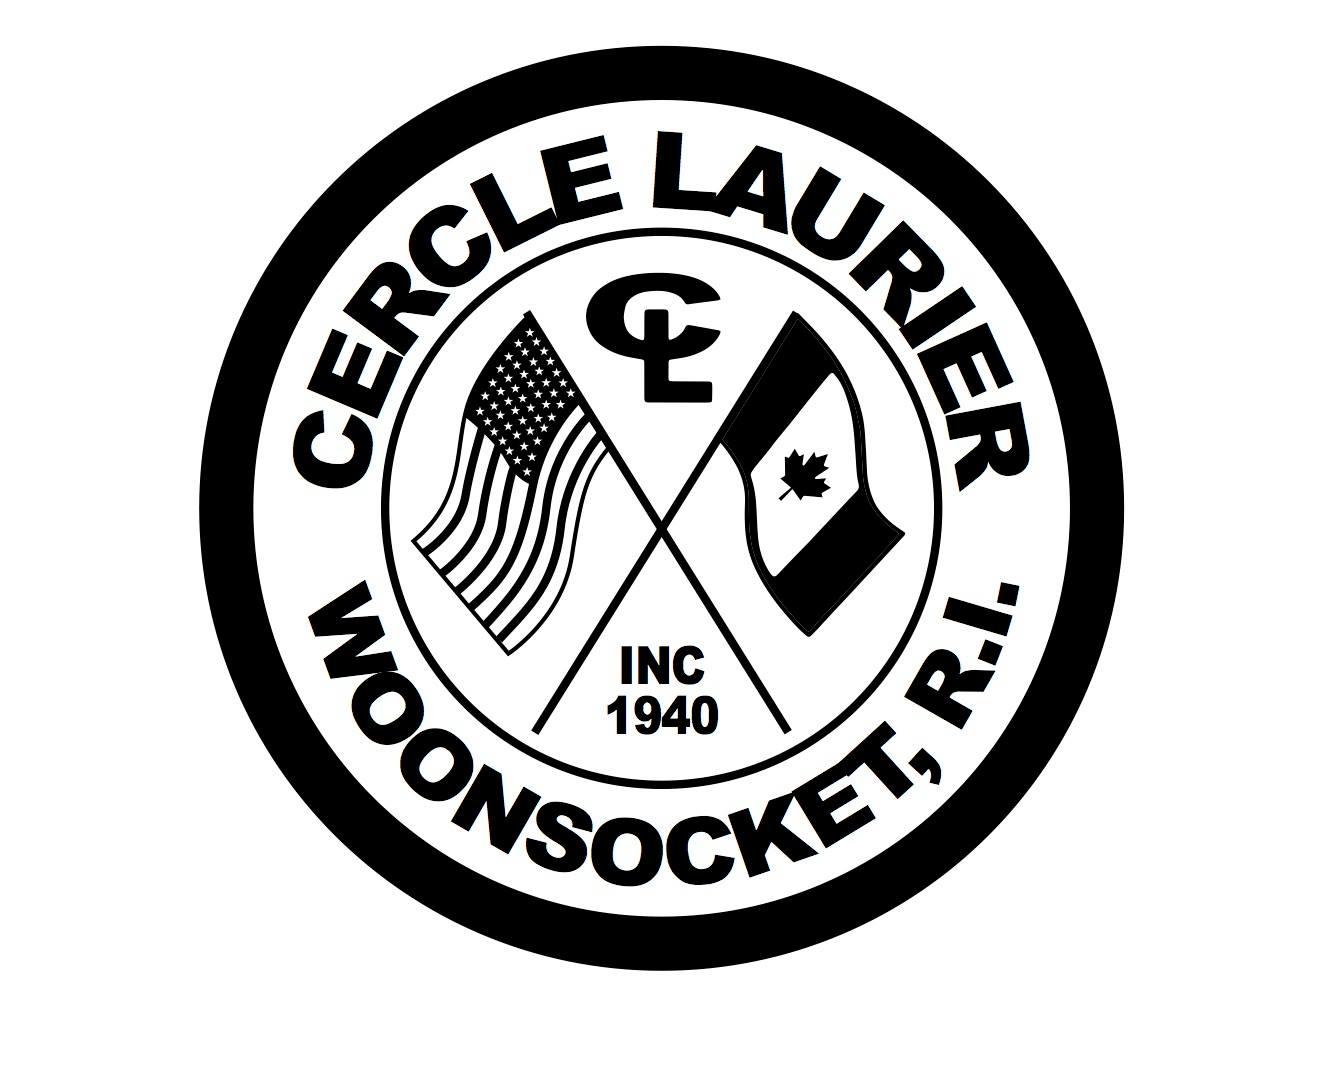 Cercle Laurier.jpg